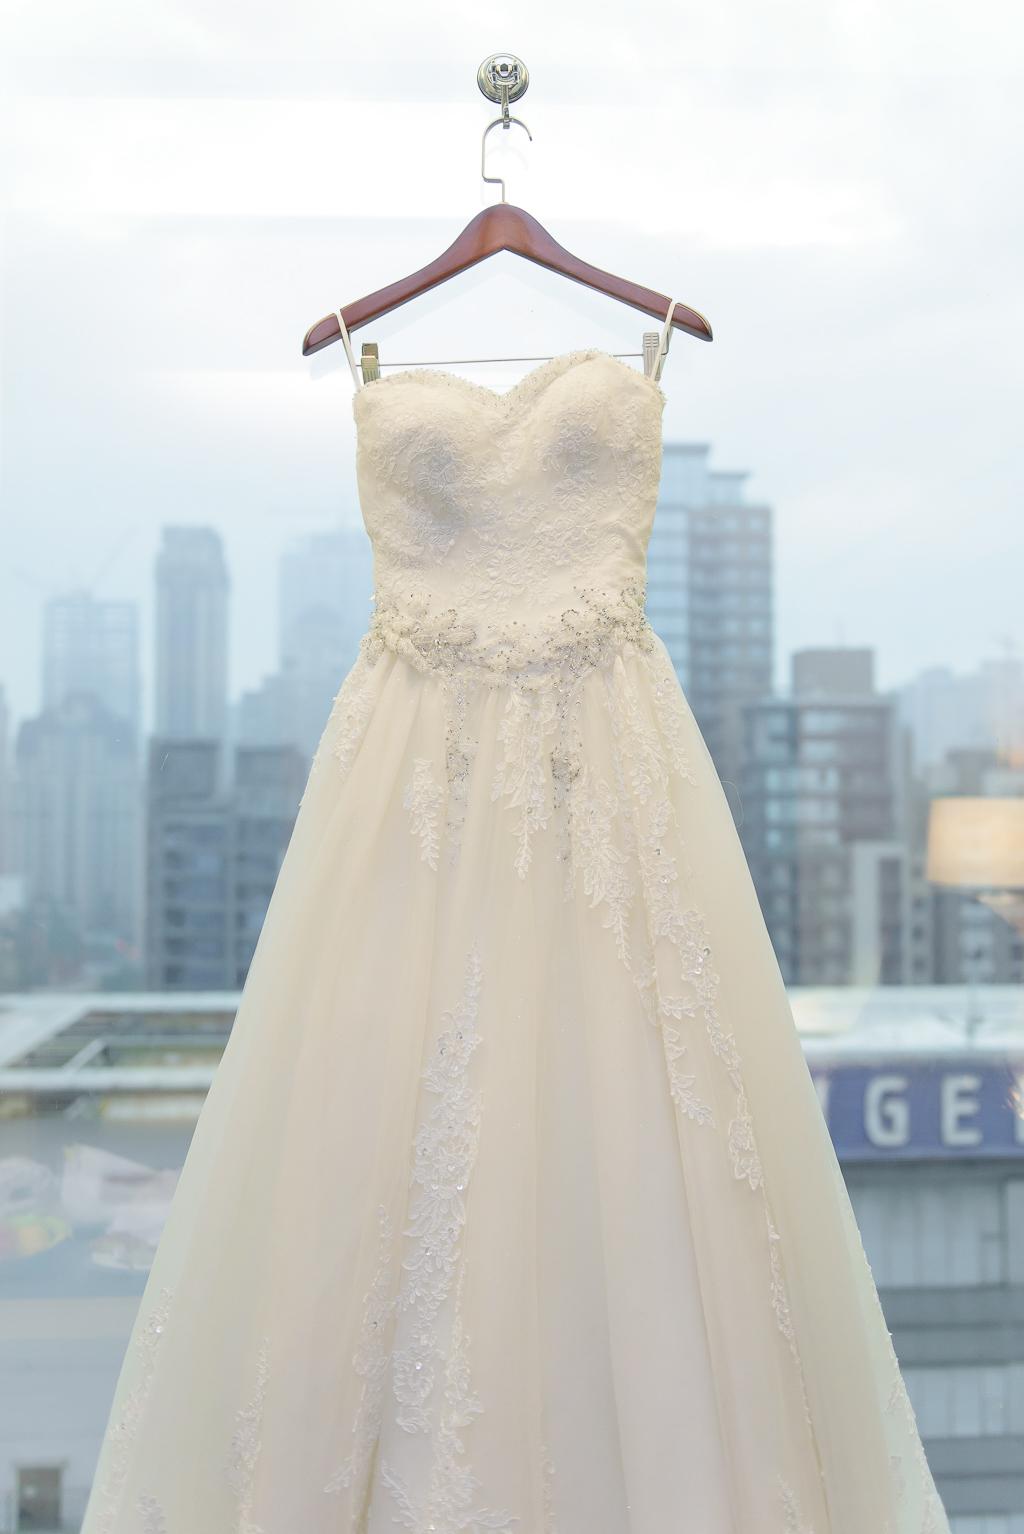 Wedding day-0001 ,僑園婚攝,台中僑園,僑園婚宴,新秘Alice ,婚攝小勇,台北婚攝, 小淑造型團隊